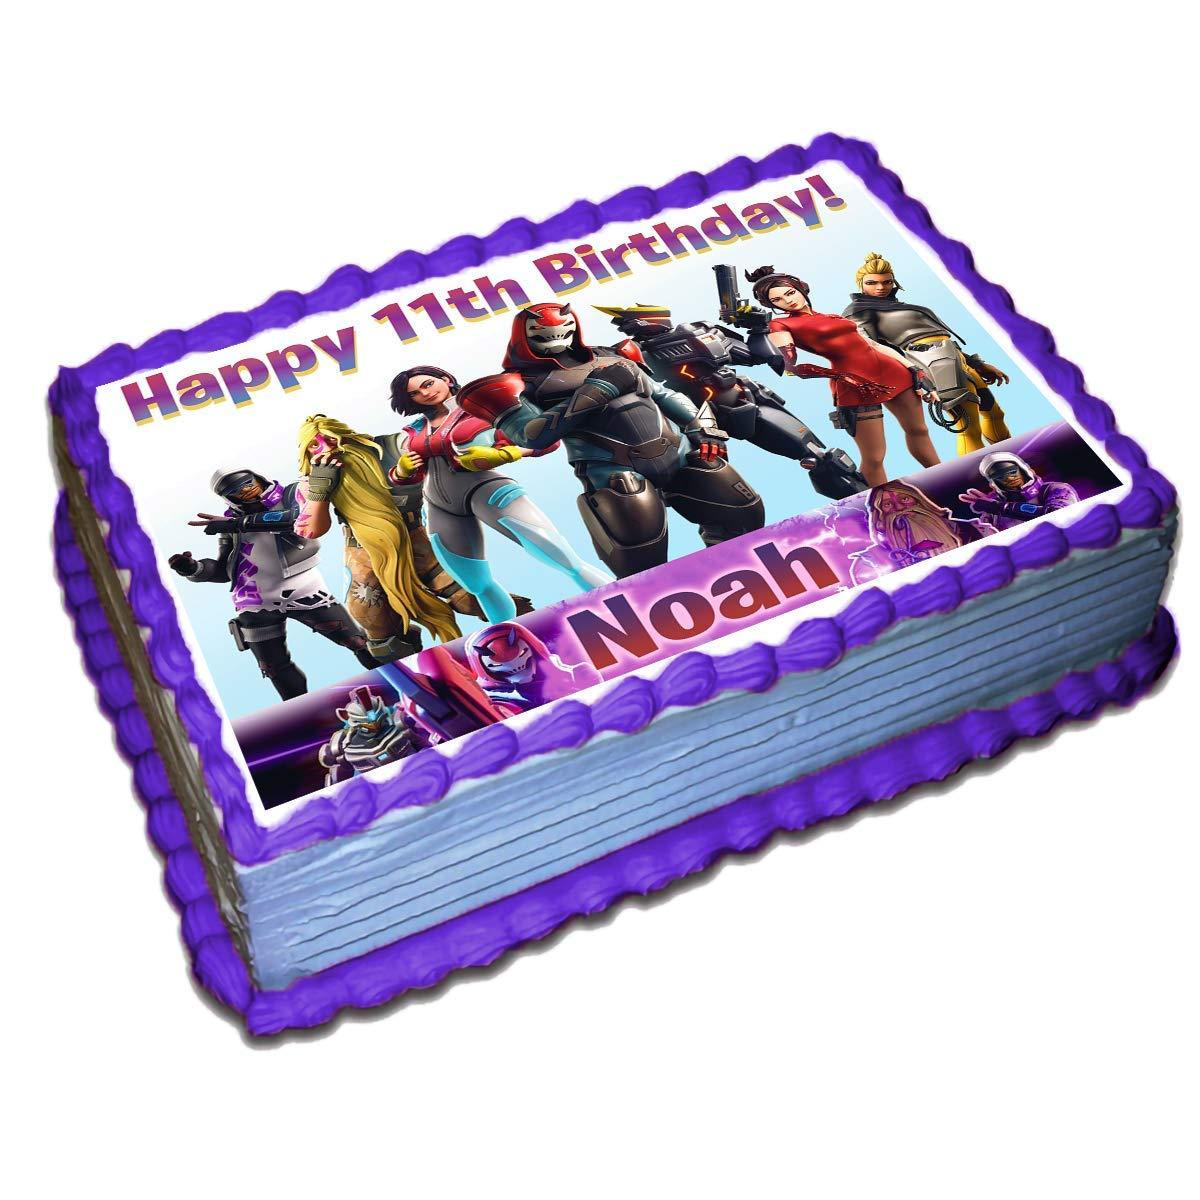 FORTNITE Season 10 Edible image Birthday Cake topper decoration